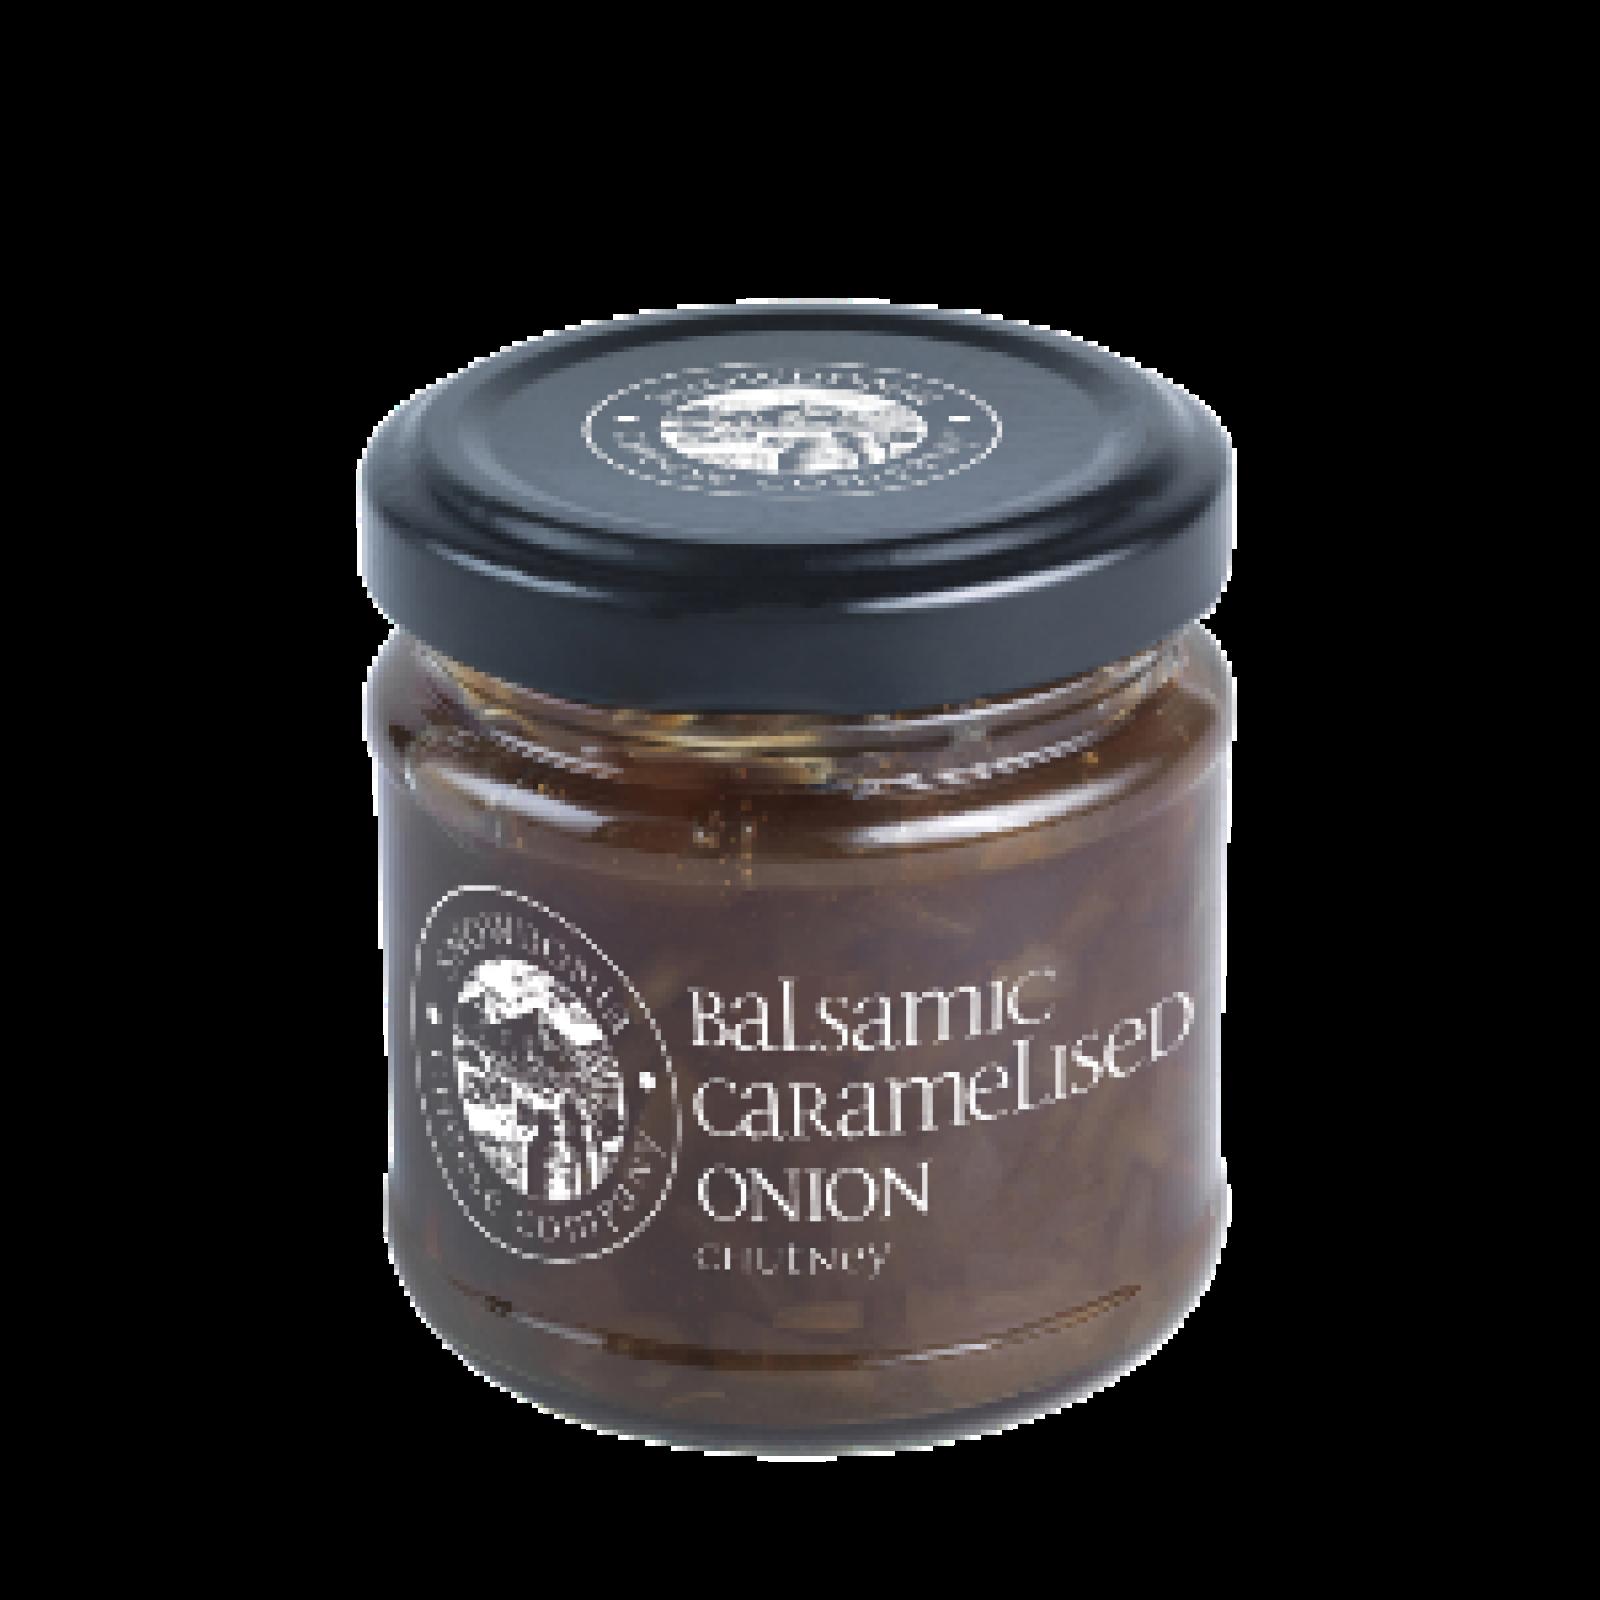 Balsamic Caramelised Onion Chutney 100g Snowdonia